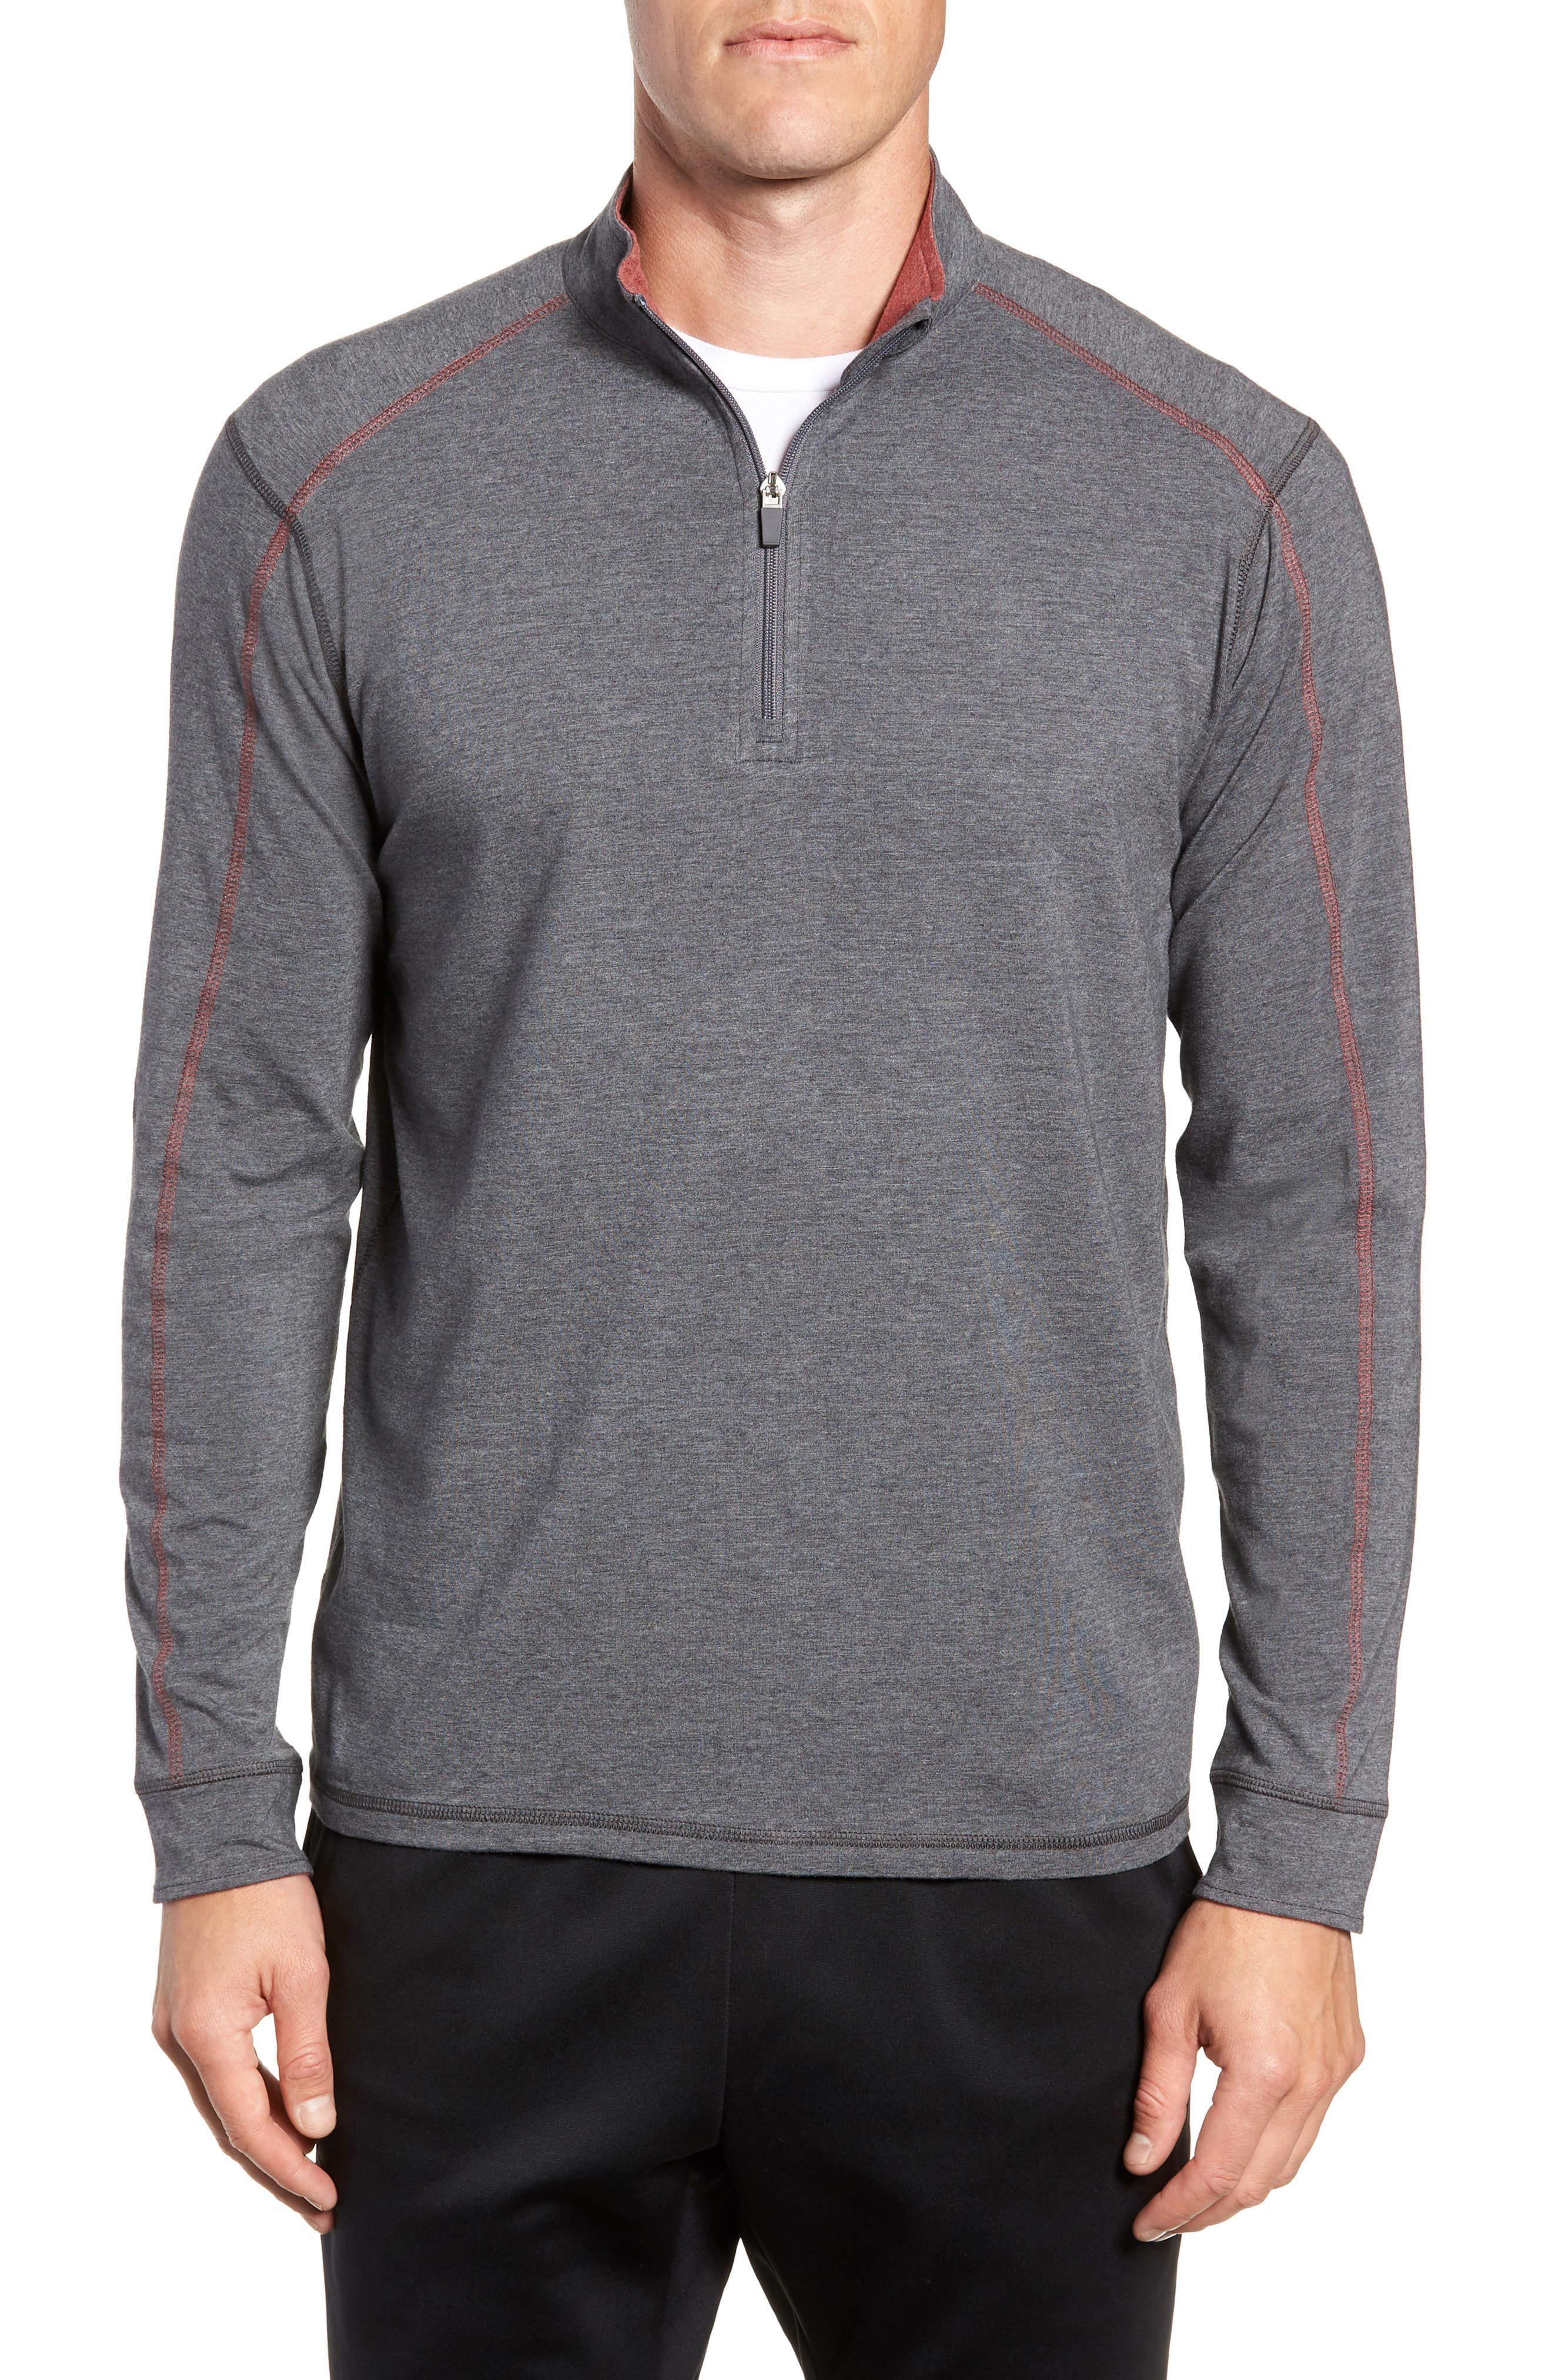 TASC PERFORMANCE, Carrollton Quarter Zip Sweatshirt, Main thumbnail 1, color, BLACK HEATHER/ MERCURY